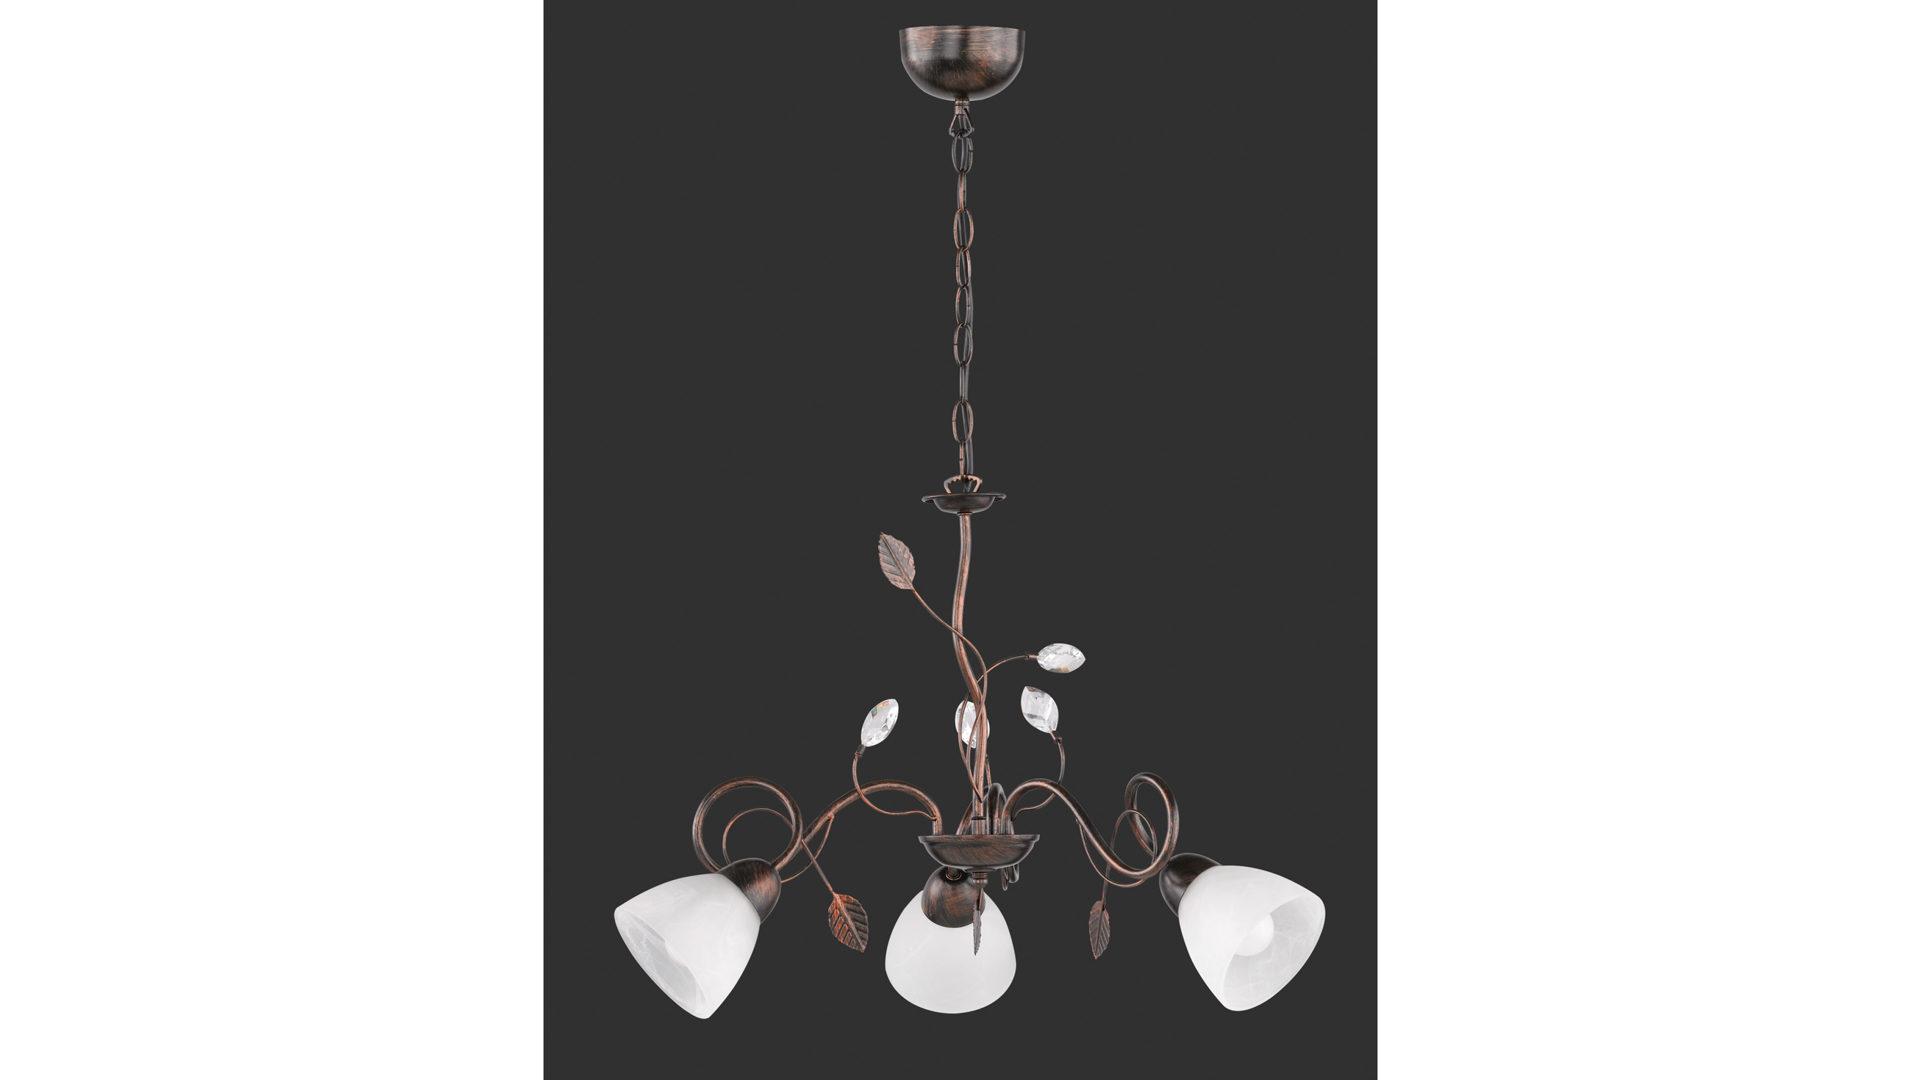 Kronleuchter Trio ~ Kronleuchter antik rostfarbenes metall u drei lampenschirme